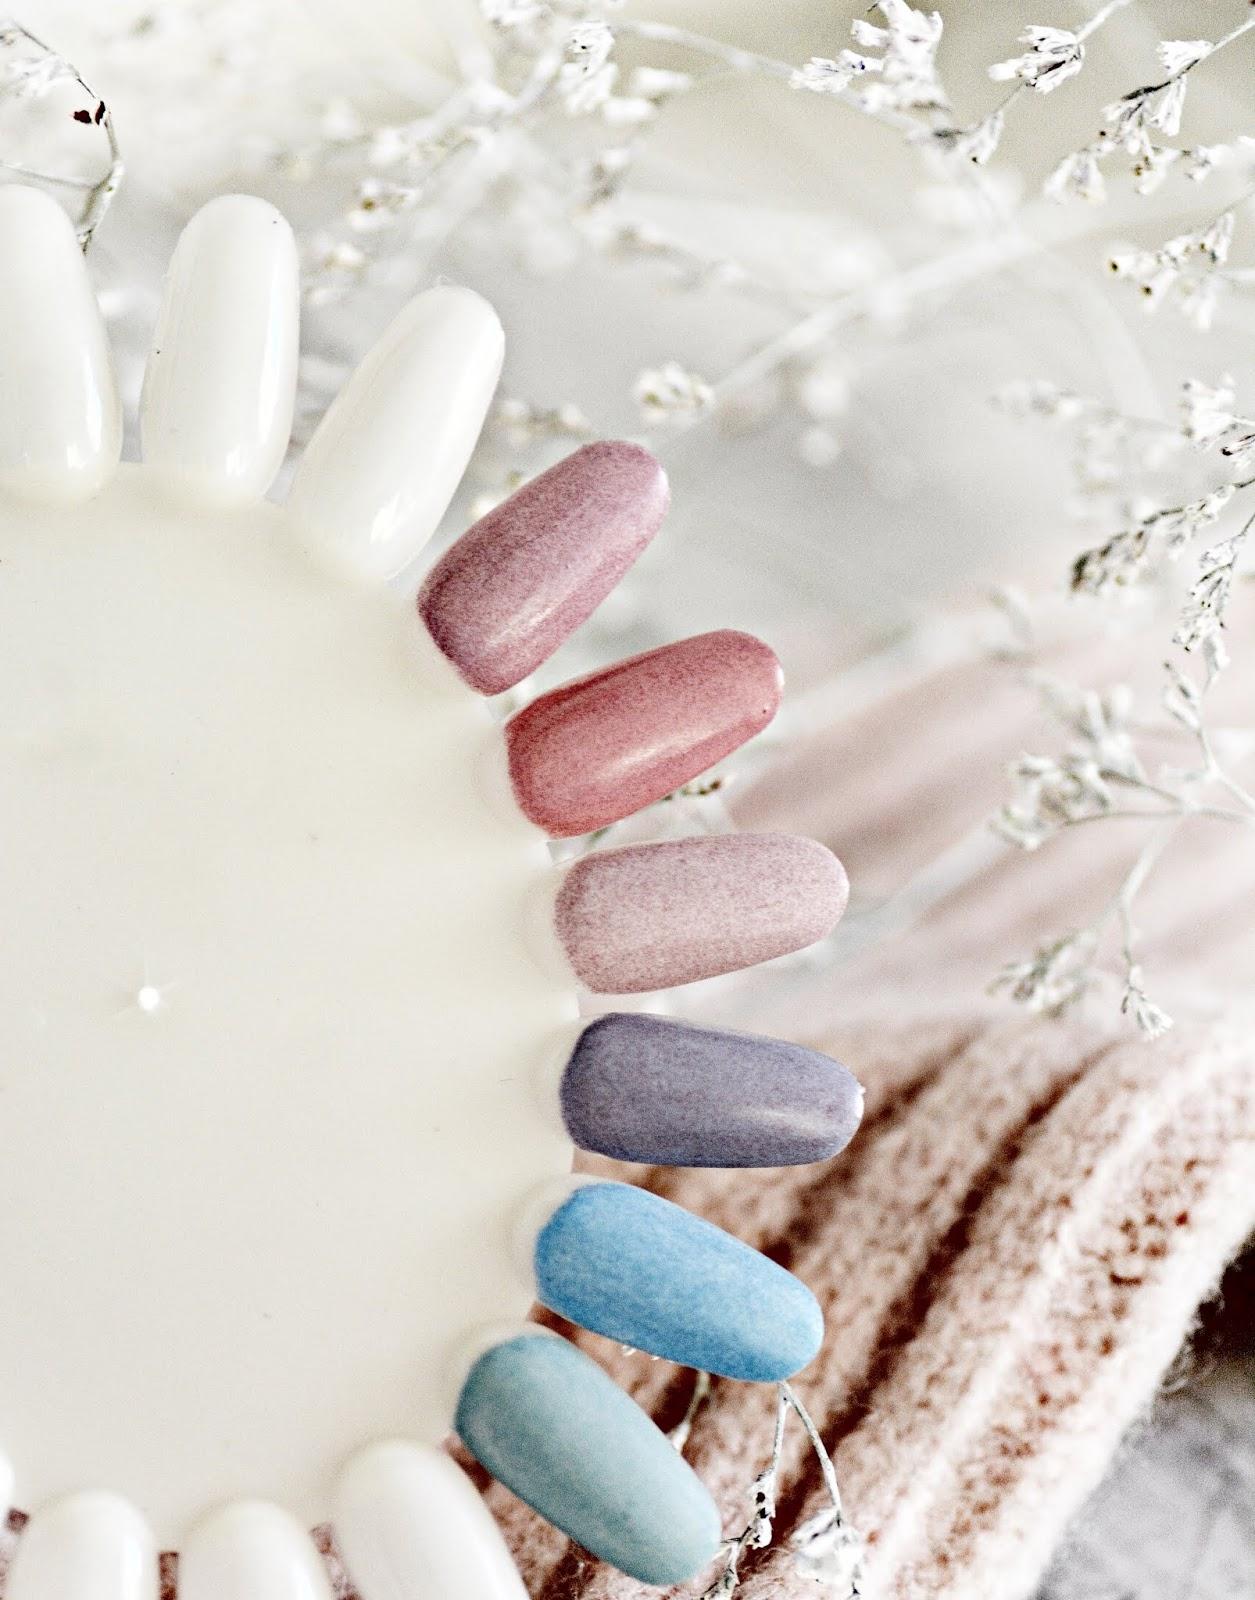 semilac sweater weather kolekcja semilac, wzronik, kolory, błysk, mat